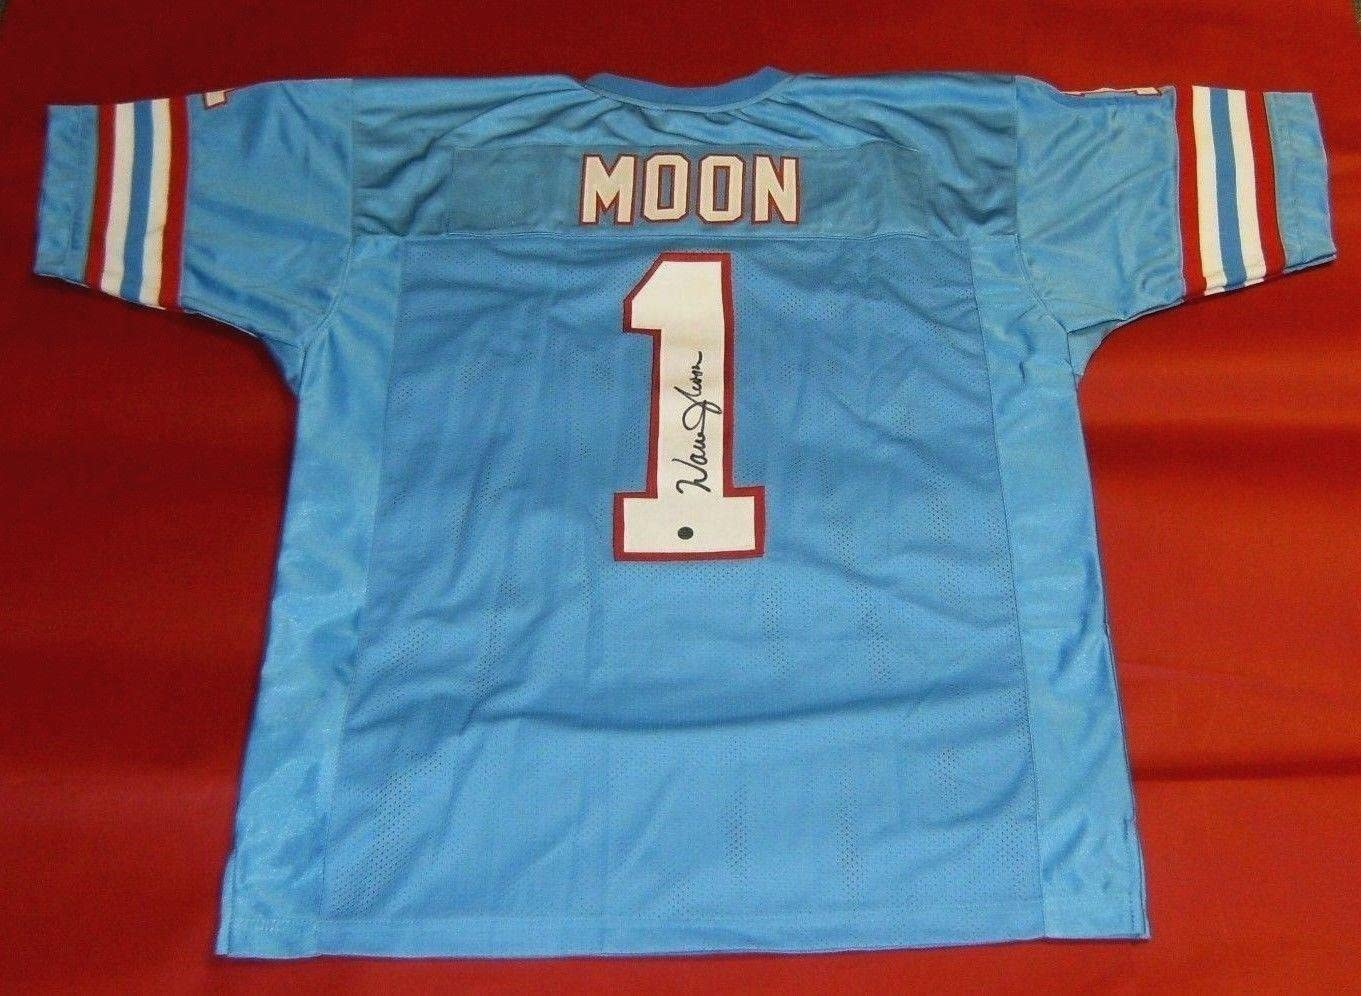 Autographed Warren Moon Jersey - Gtsm - GTSM Certified - Autographed NFL Jerseys